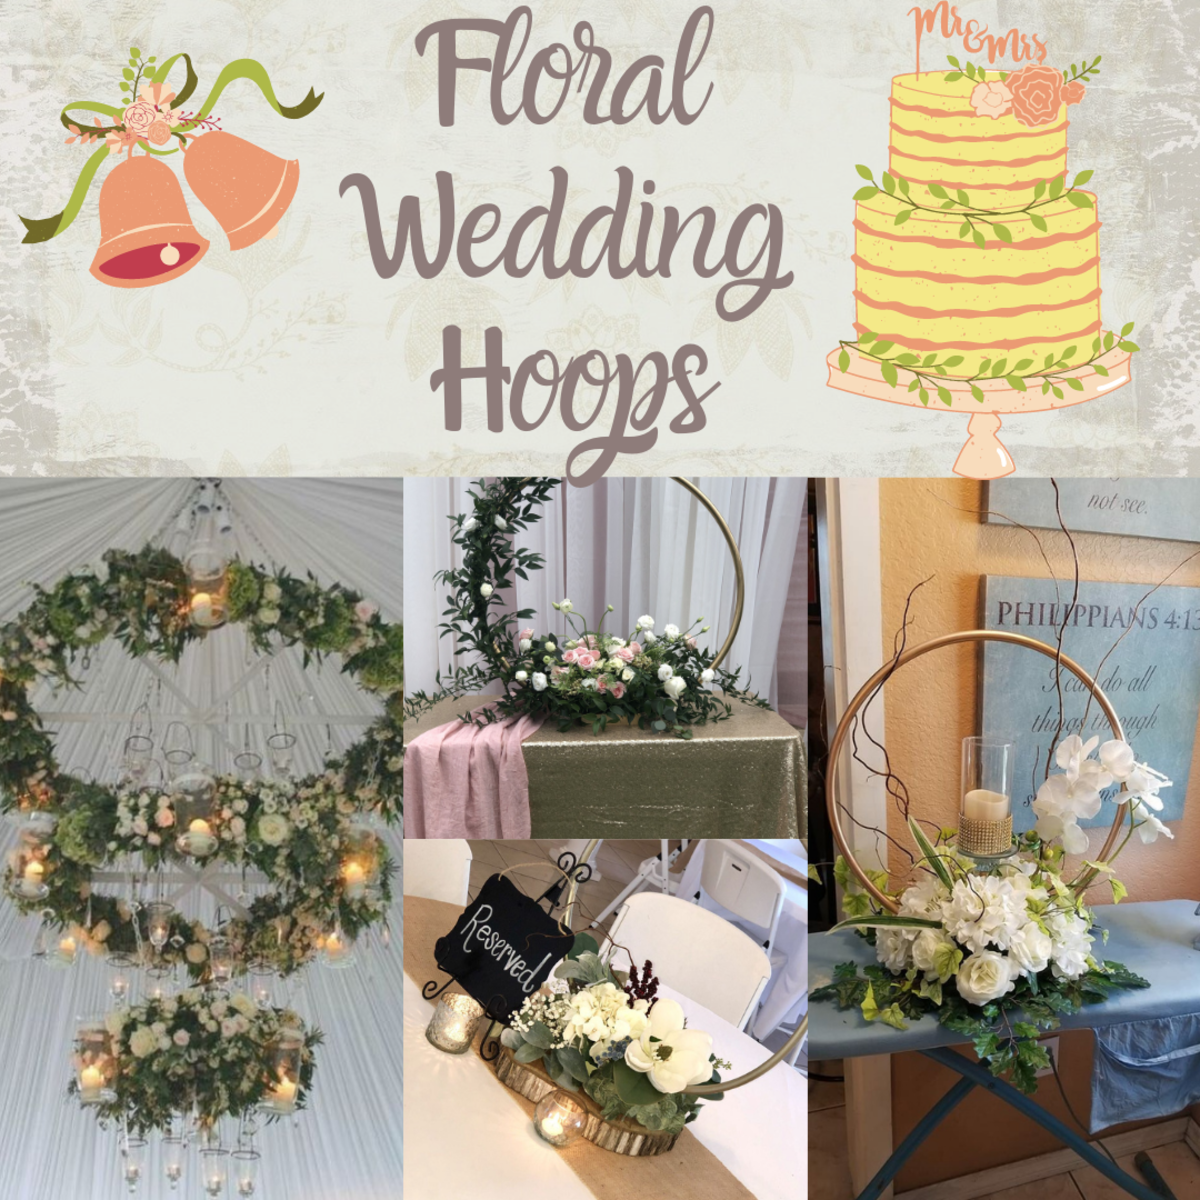 Floral Hoop Wedding Centerpieces